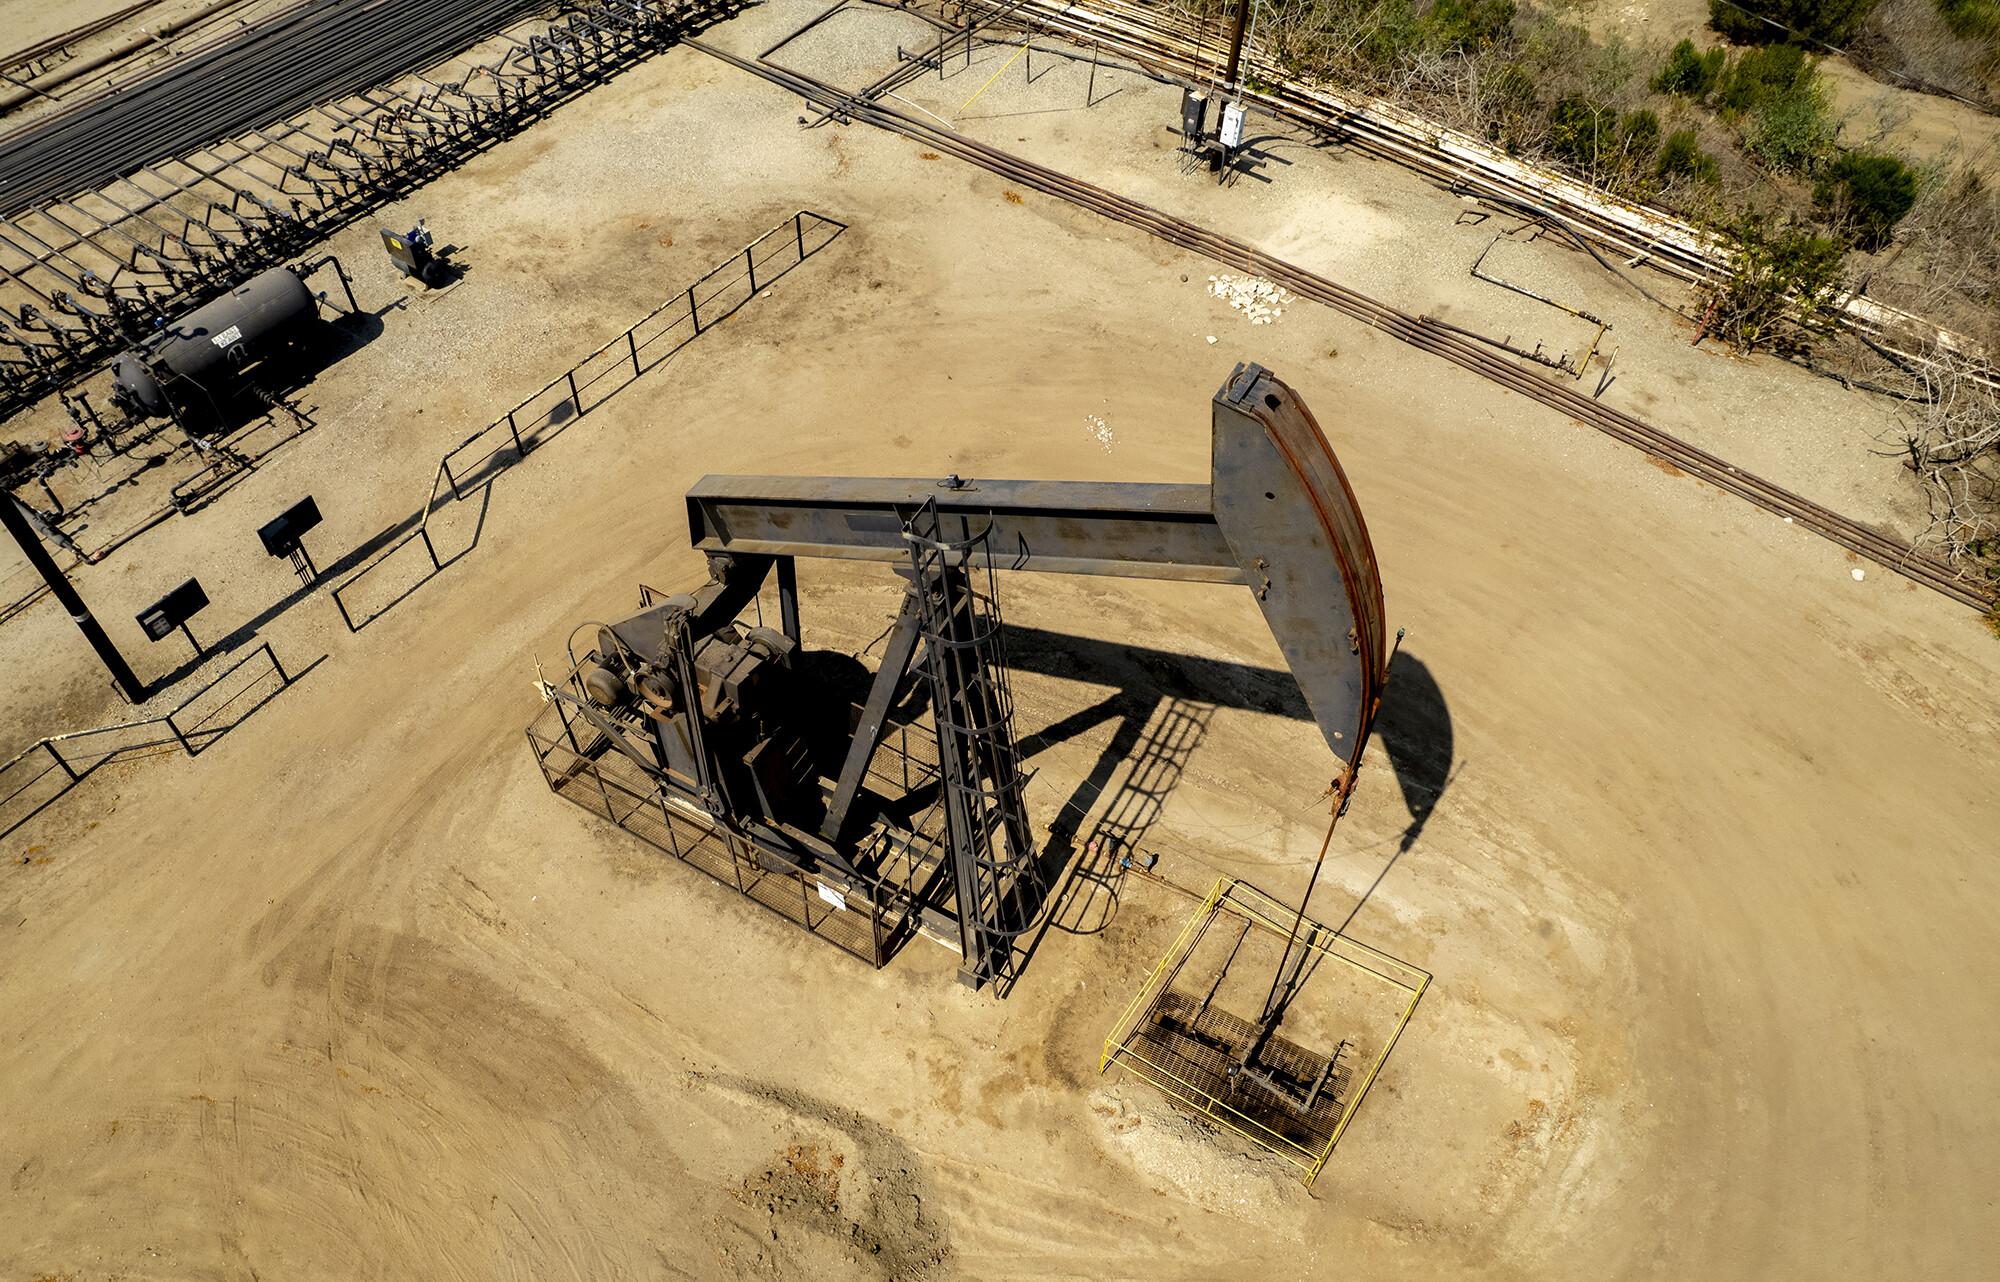 Gas prices skyrocket as the global energy crisis worsens